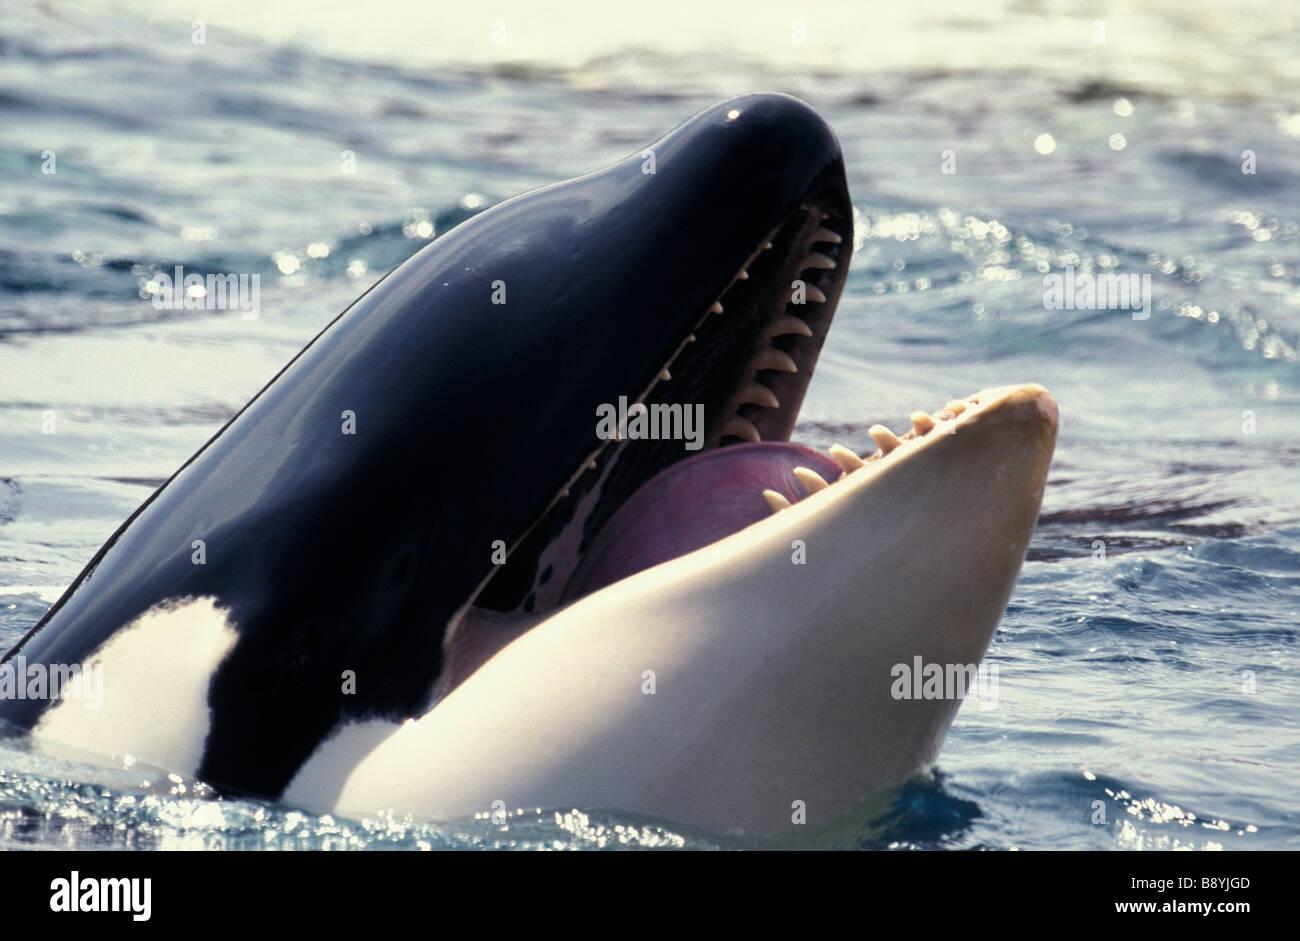 Orque ENDANGERED SPECIES CANADA British Columbia Orca Of Killer Whale Stock Photo: 22734893